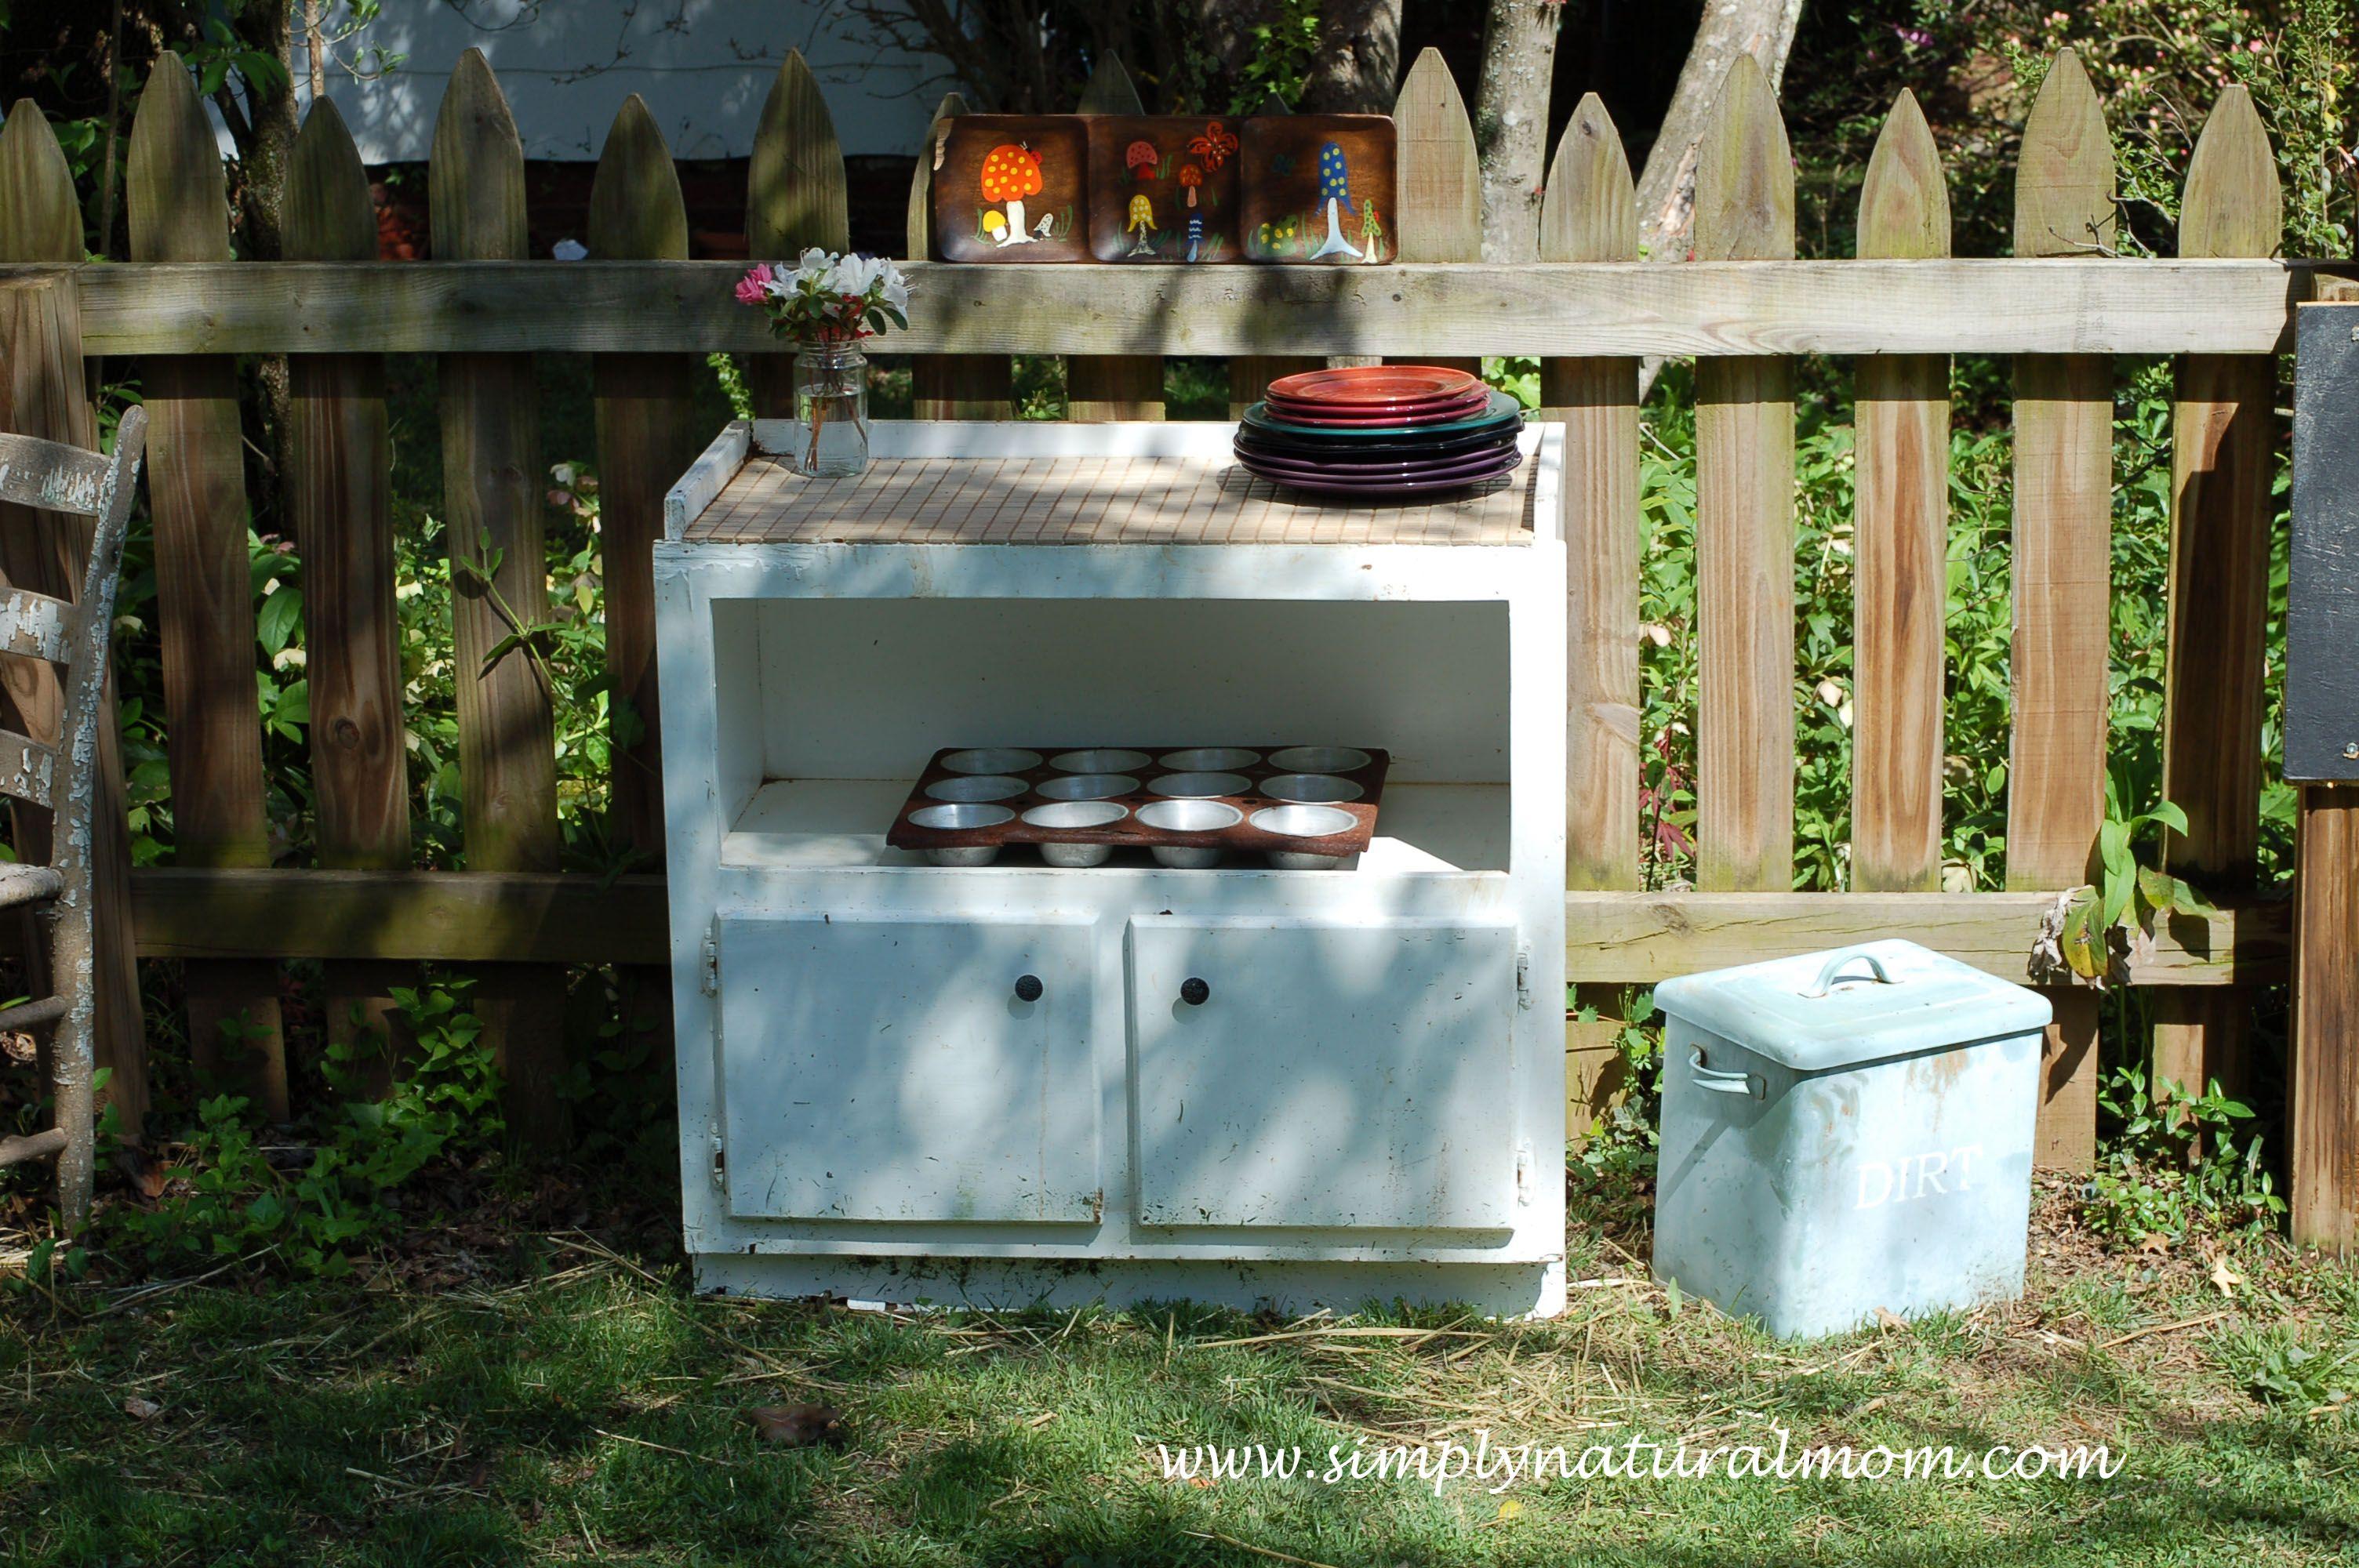 Related image Mud pie kitchen, Mud pie, Backyard fun